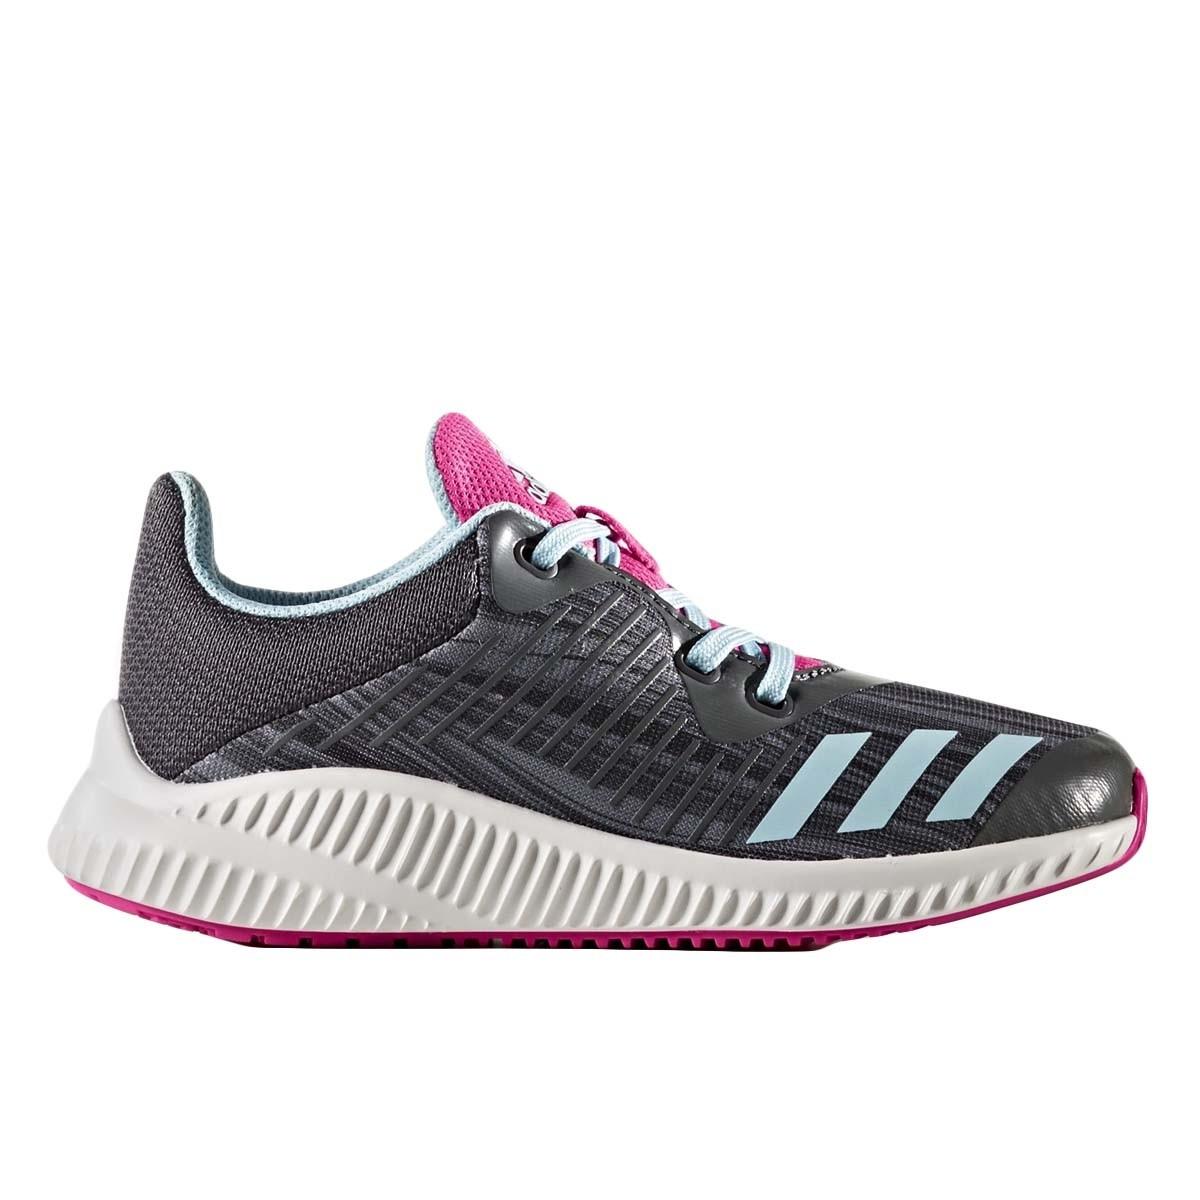 677ba0c5b5e Adidas FORTARUN K ΑΘΛΗΤΙΚΟ ΕΦΗΒΙΚΟ-ΓΥΝΑΙΚΕΙΟ - BY9001 | Sportifs.gr ...